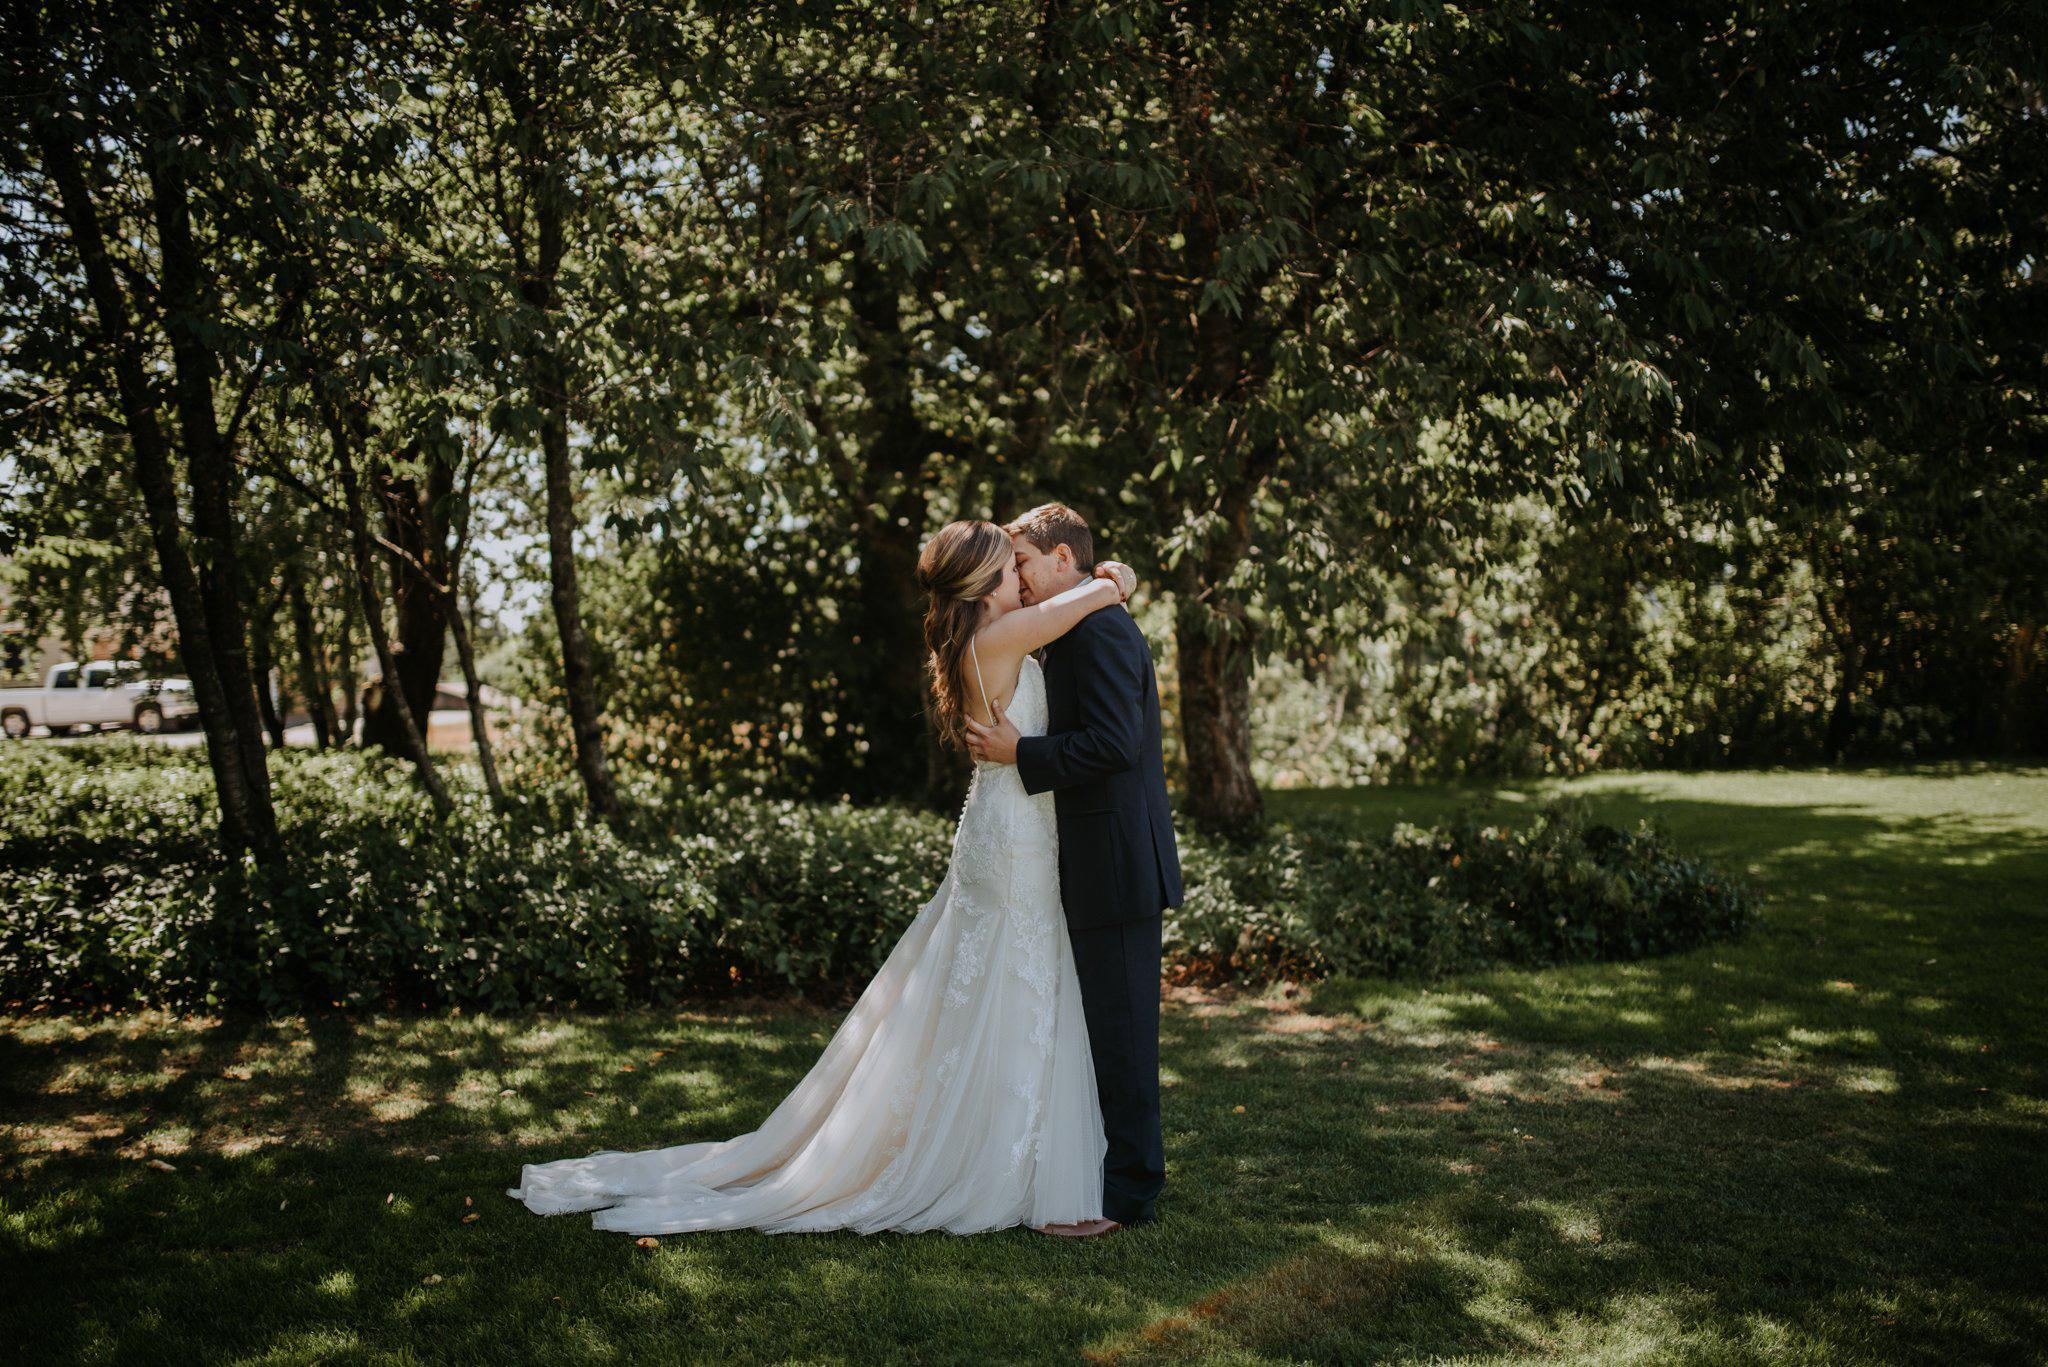 kristen-and-cody-the-kelley-farm-wedding-seattle-photographer-caitlyn-nikula-33.jpg